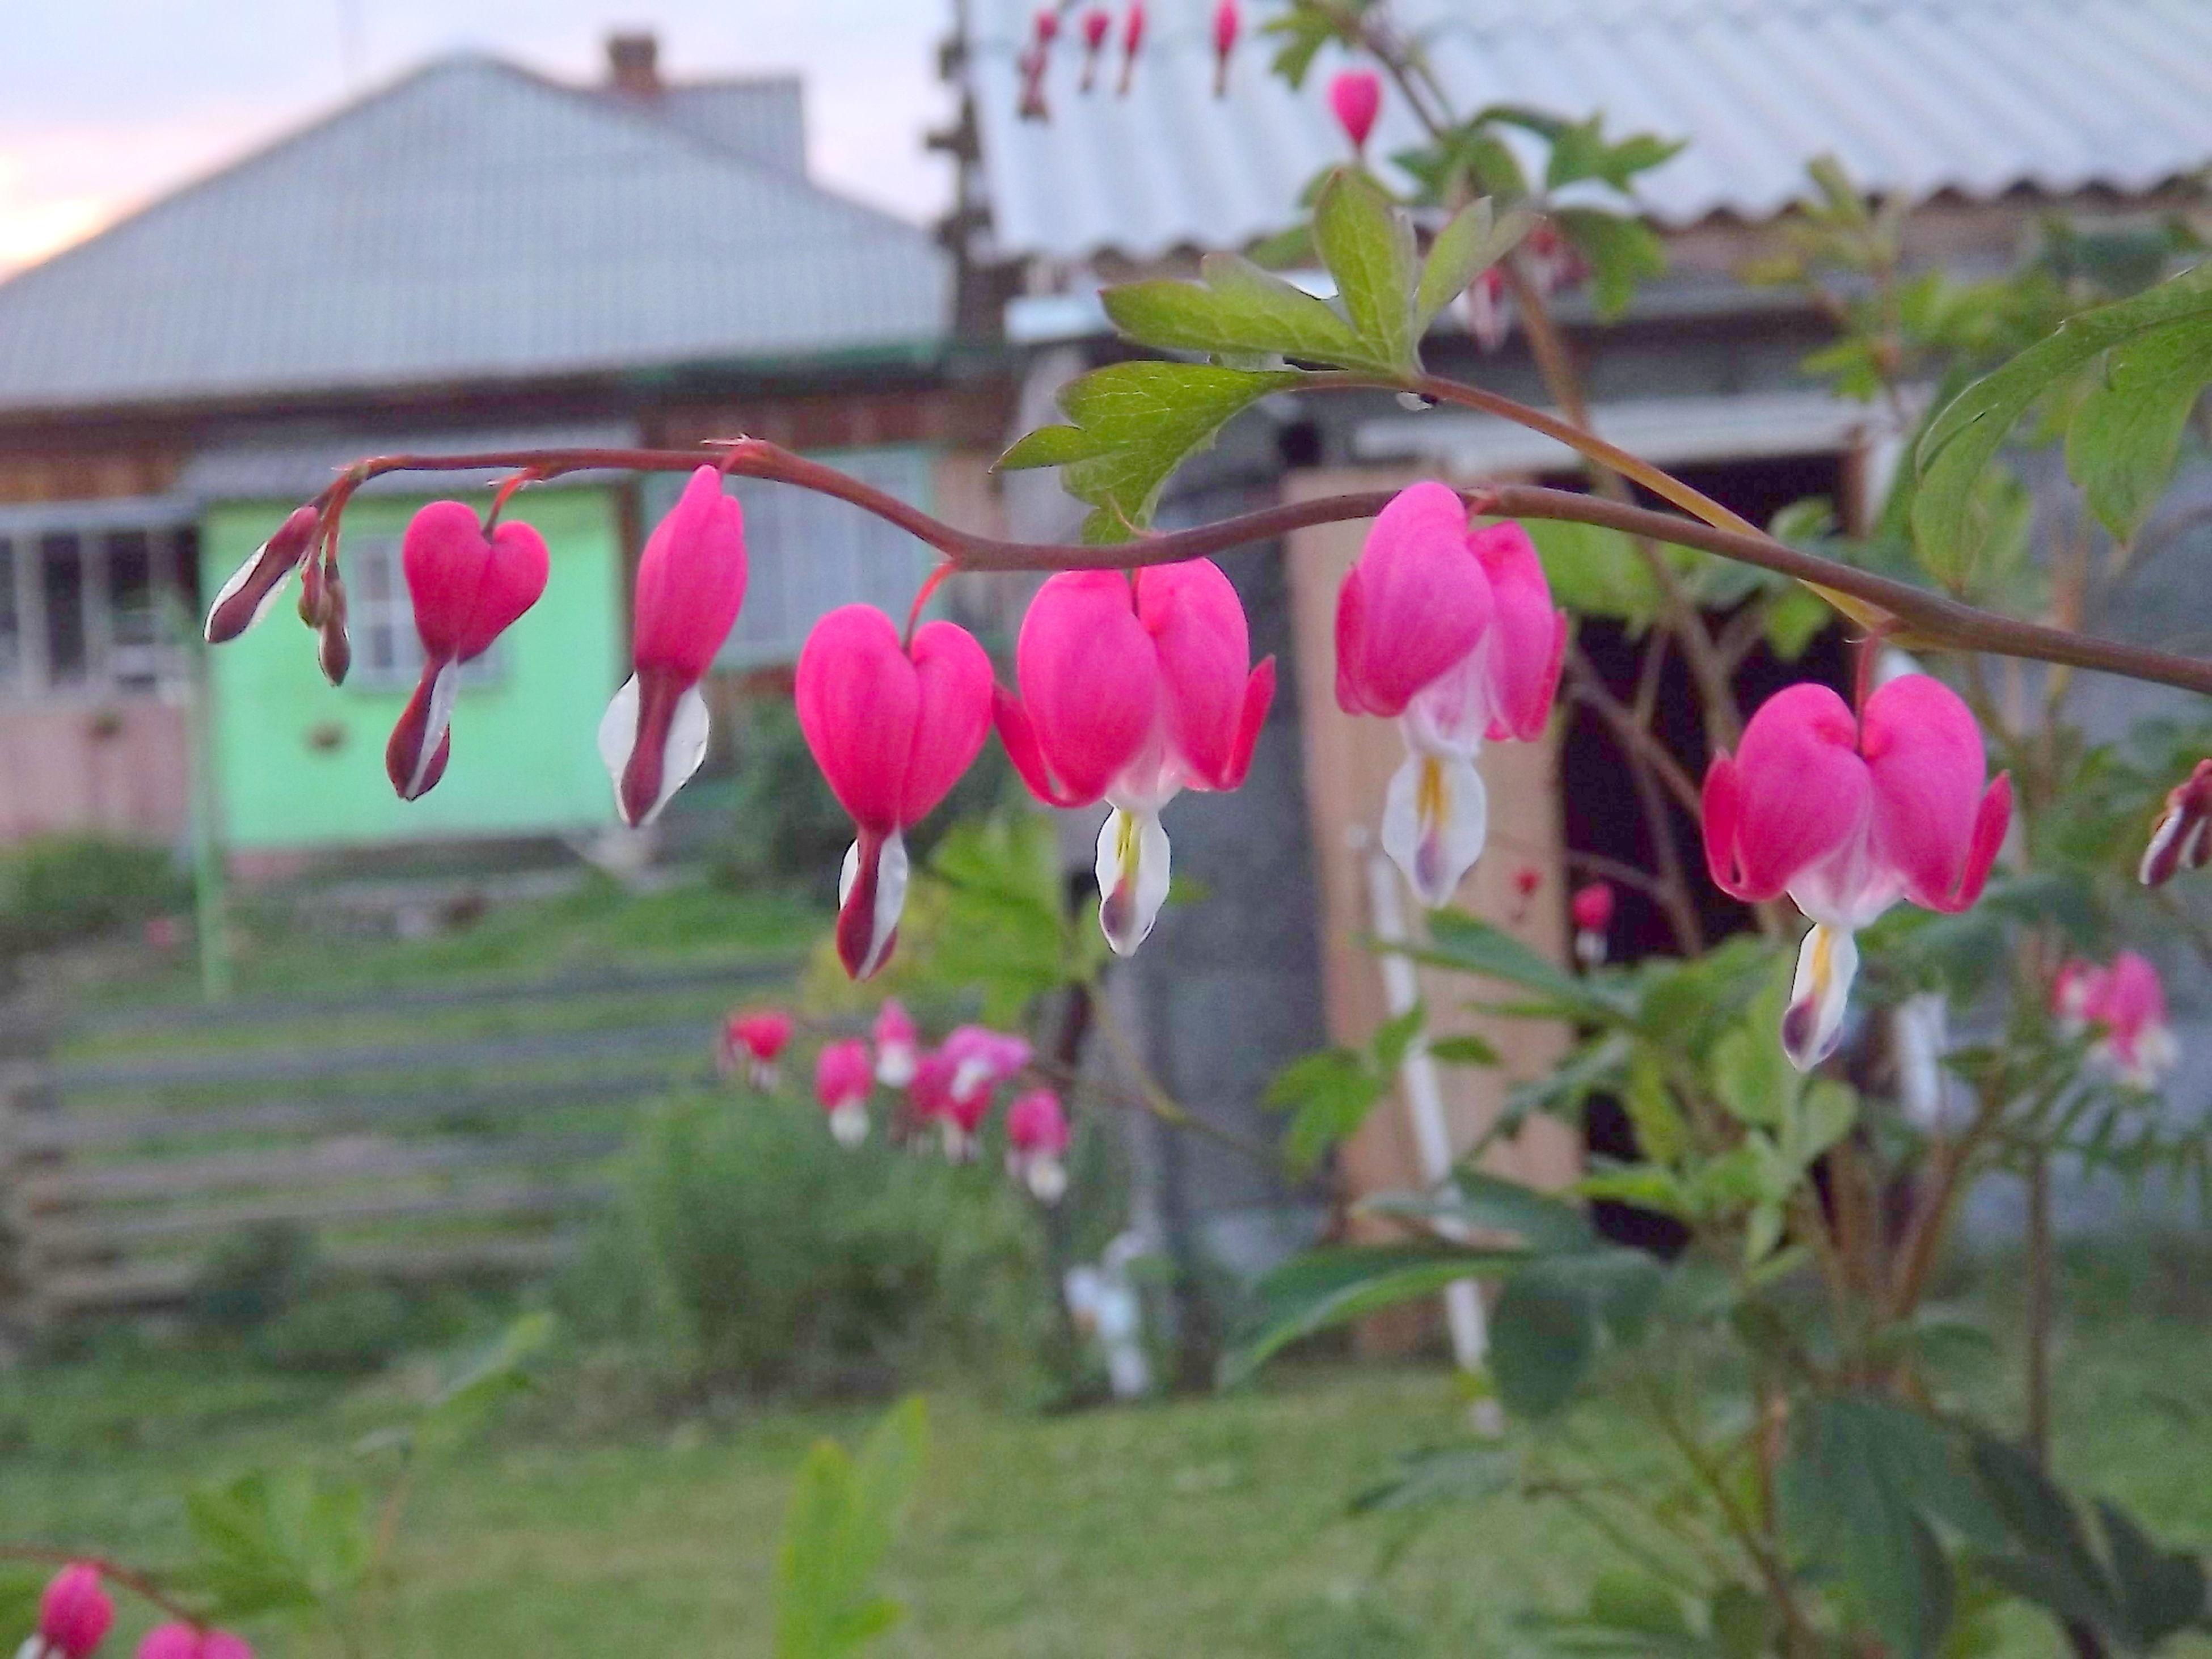 Природа♥ красота♥цветы ♥ First Eyeem Photo